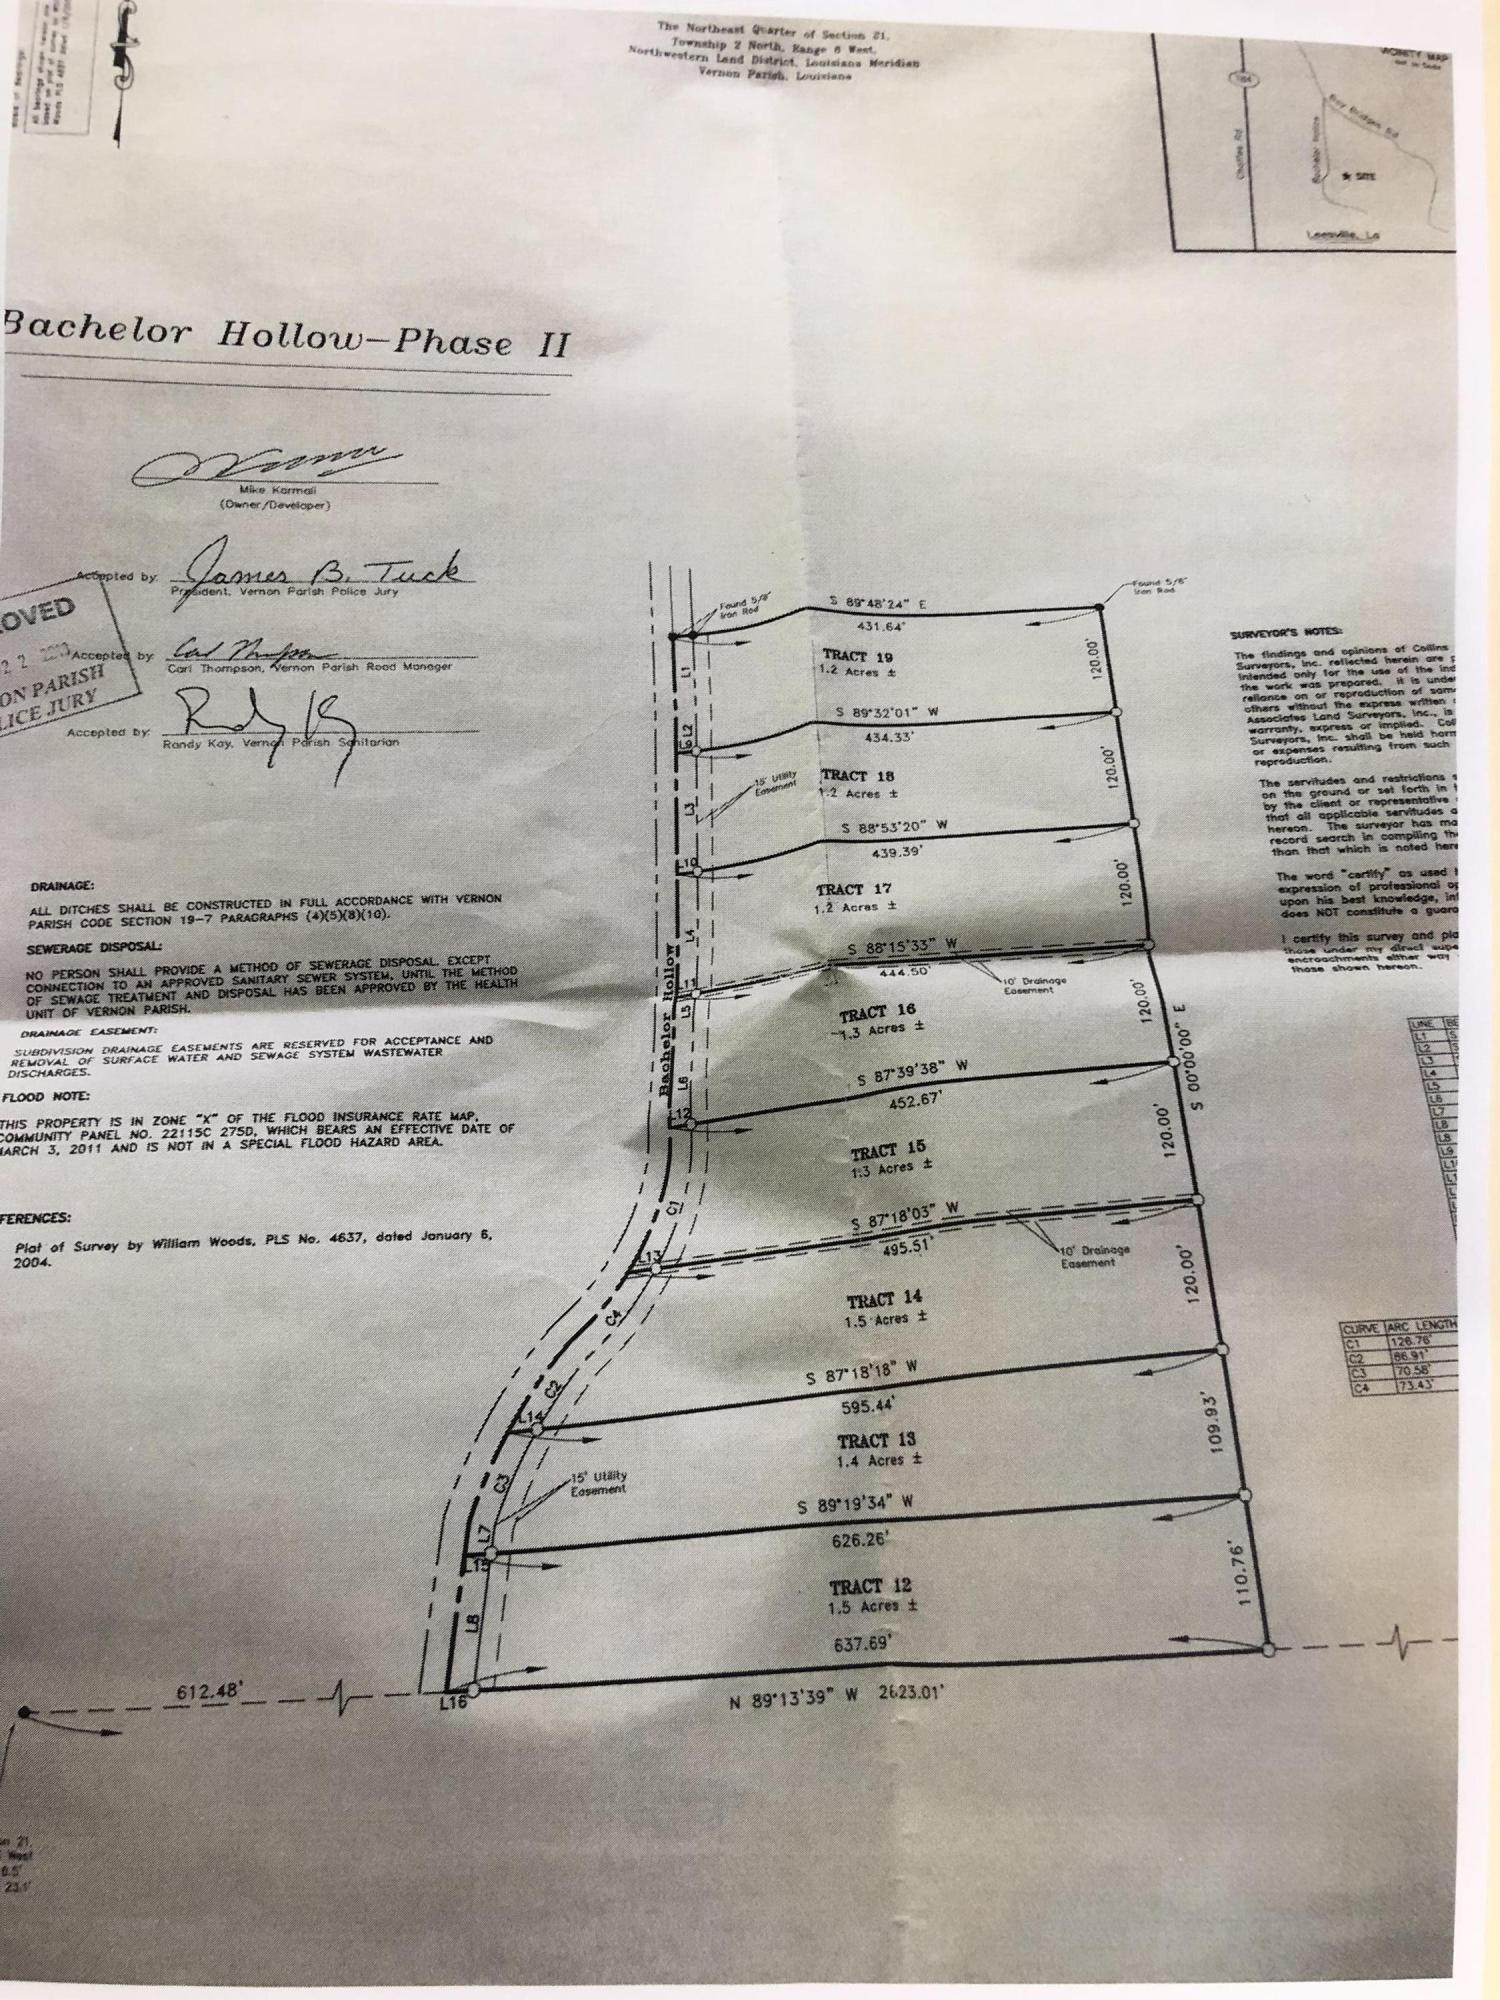 Leesville land for sale,  Bachelor Hollow Lot 13, Leesville LA - $20,900